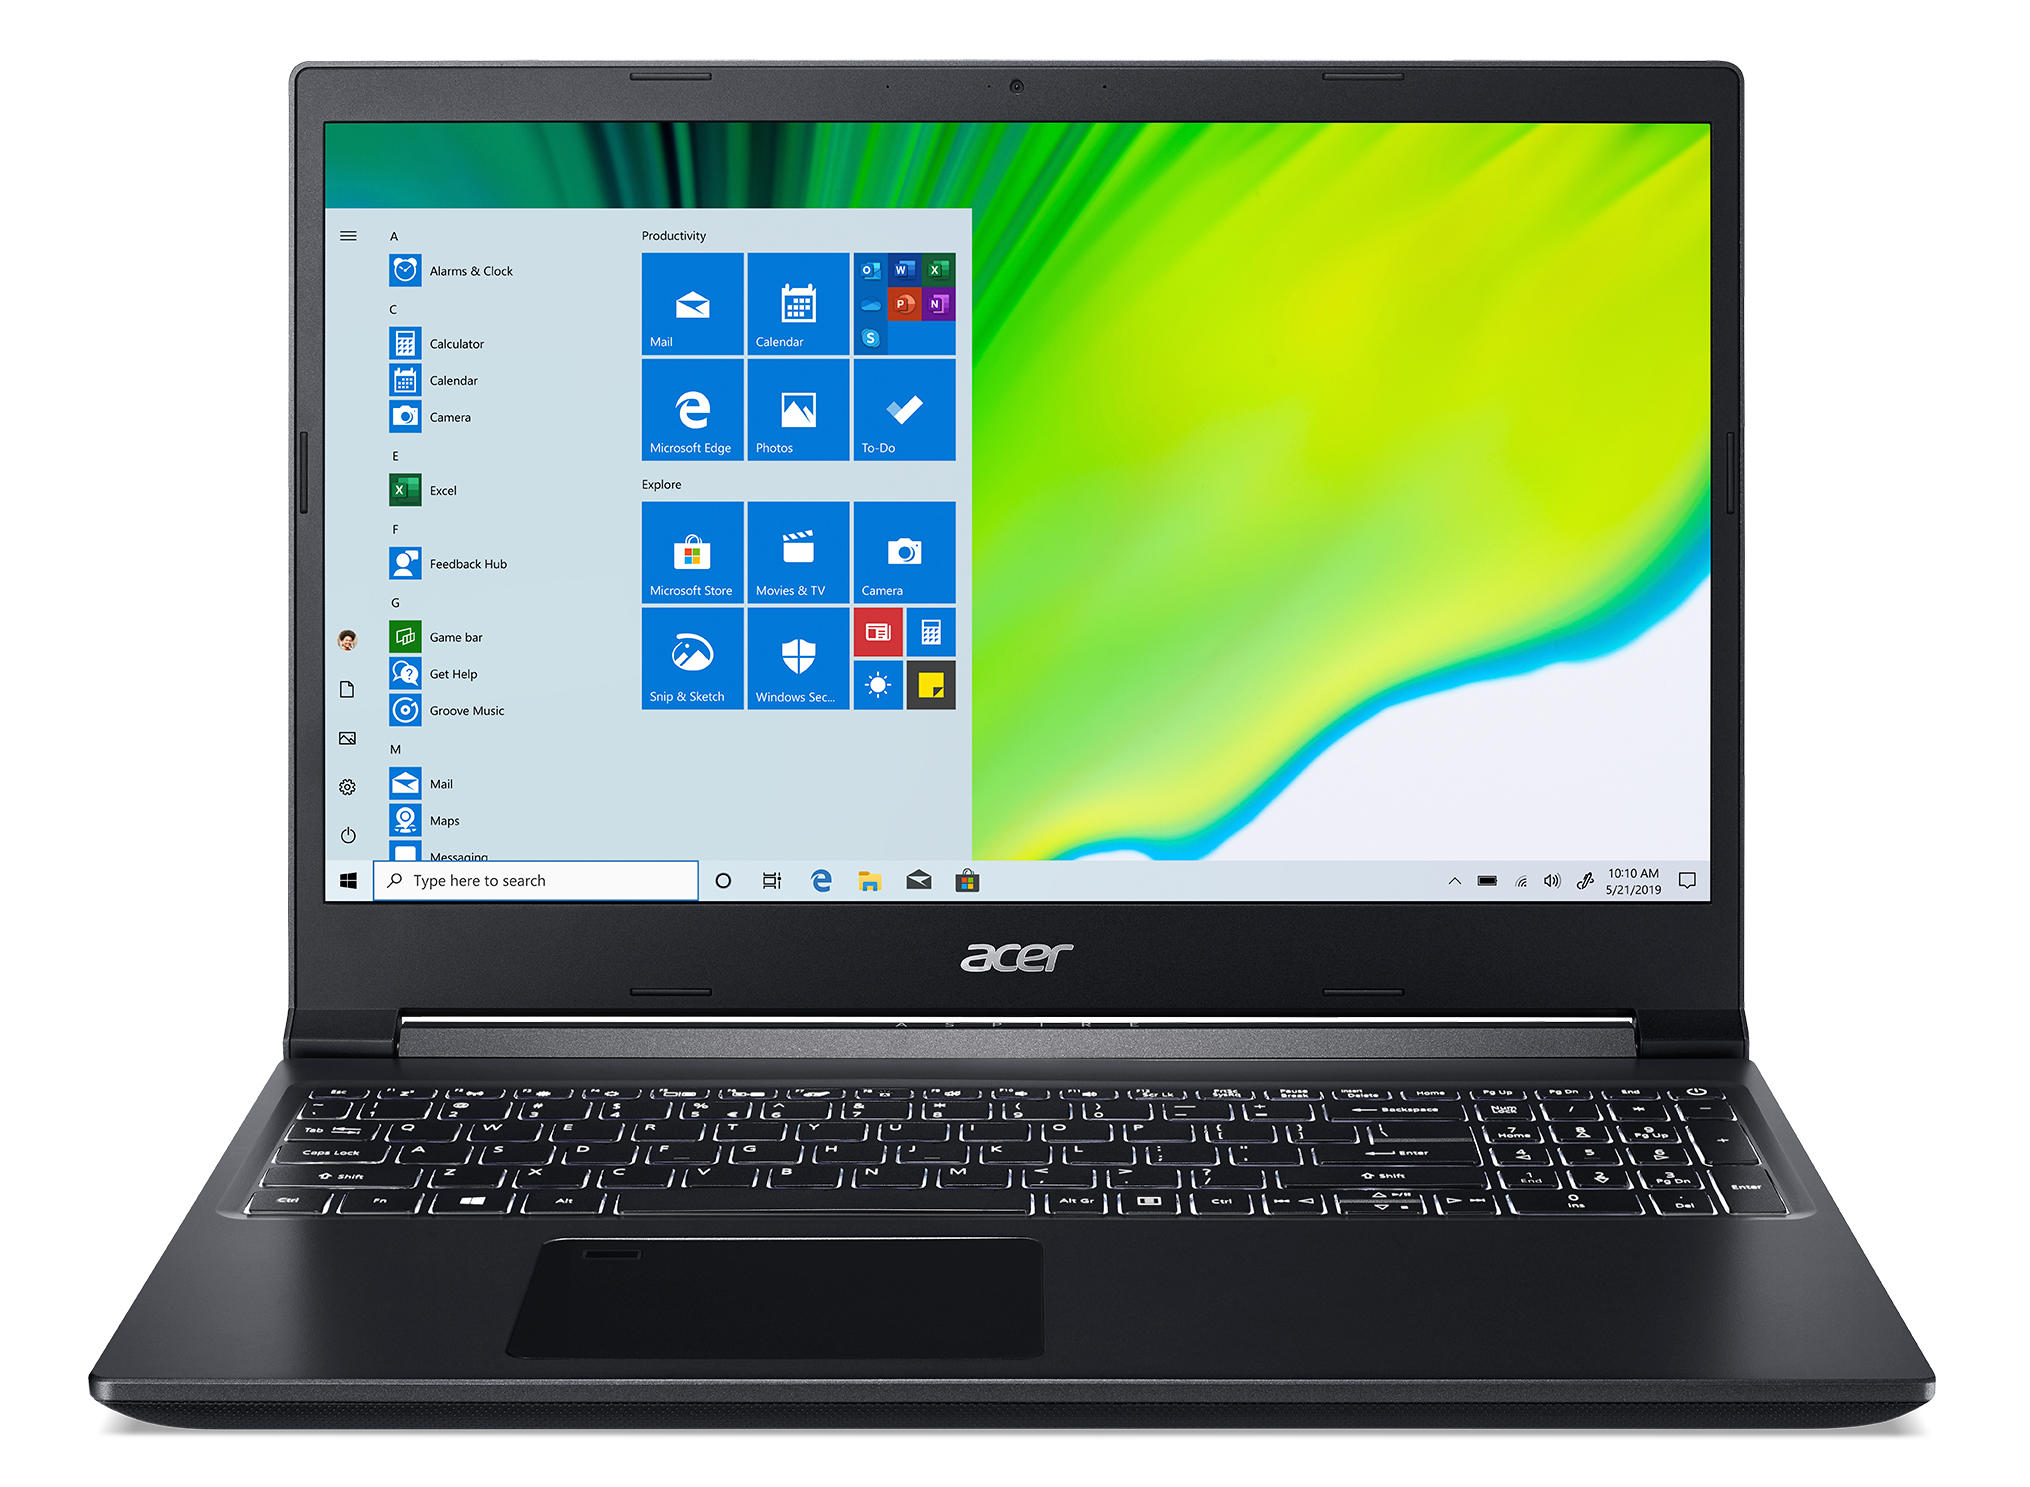 Acer Aspire 7 A715-75G-70NY laptop